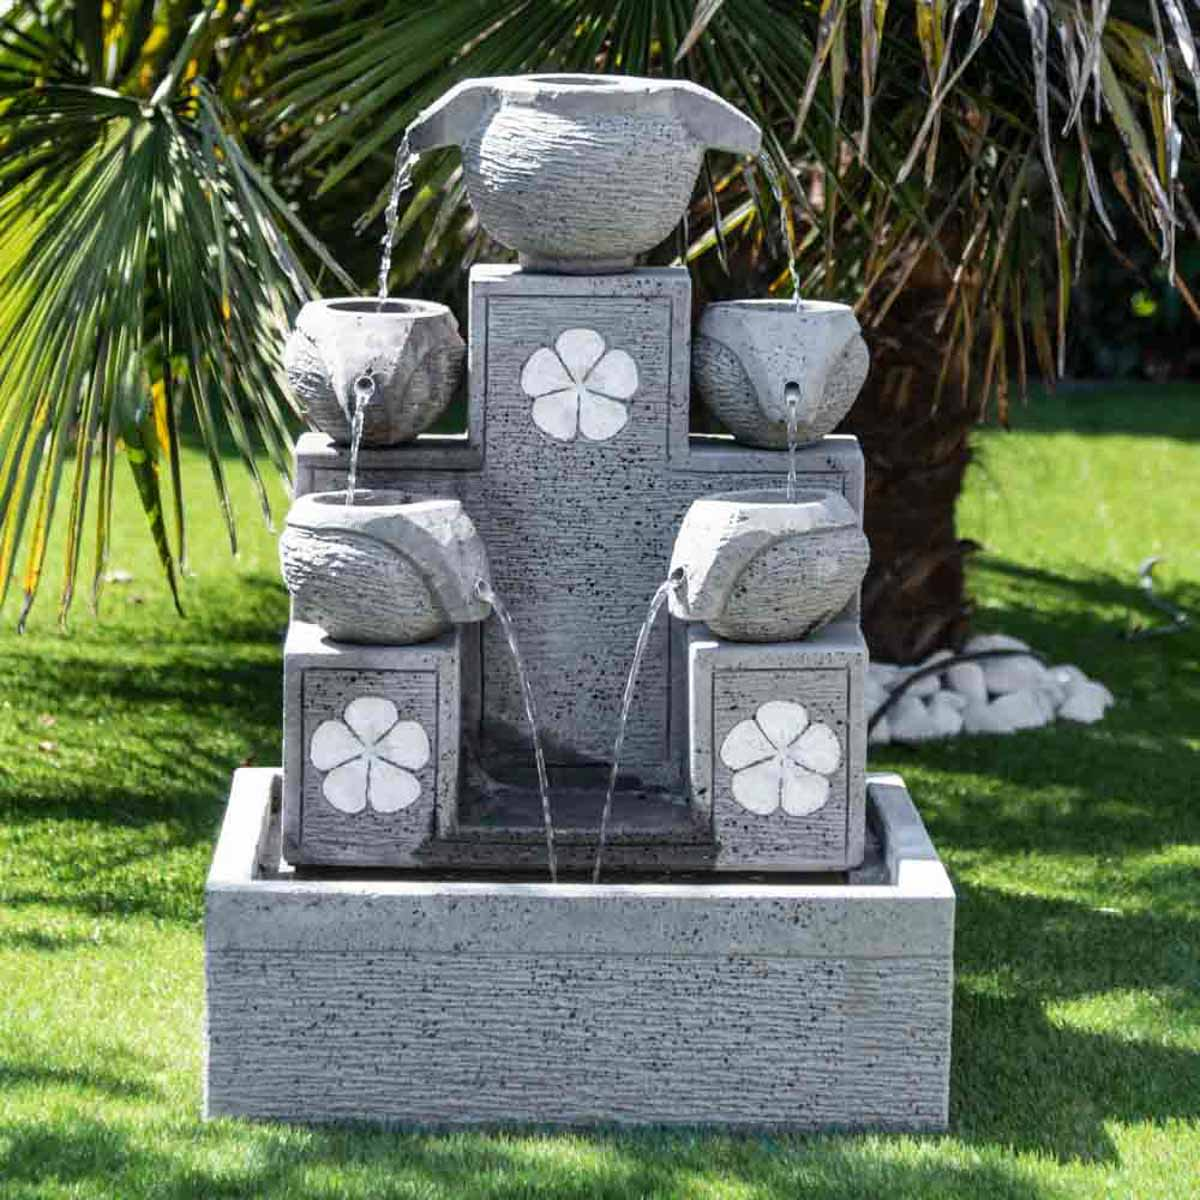 fontaine de jardin fontaine cascade 90 cm grise ciment. Black Bedroom Furniture Sets. Home Design Ideas